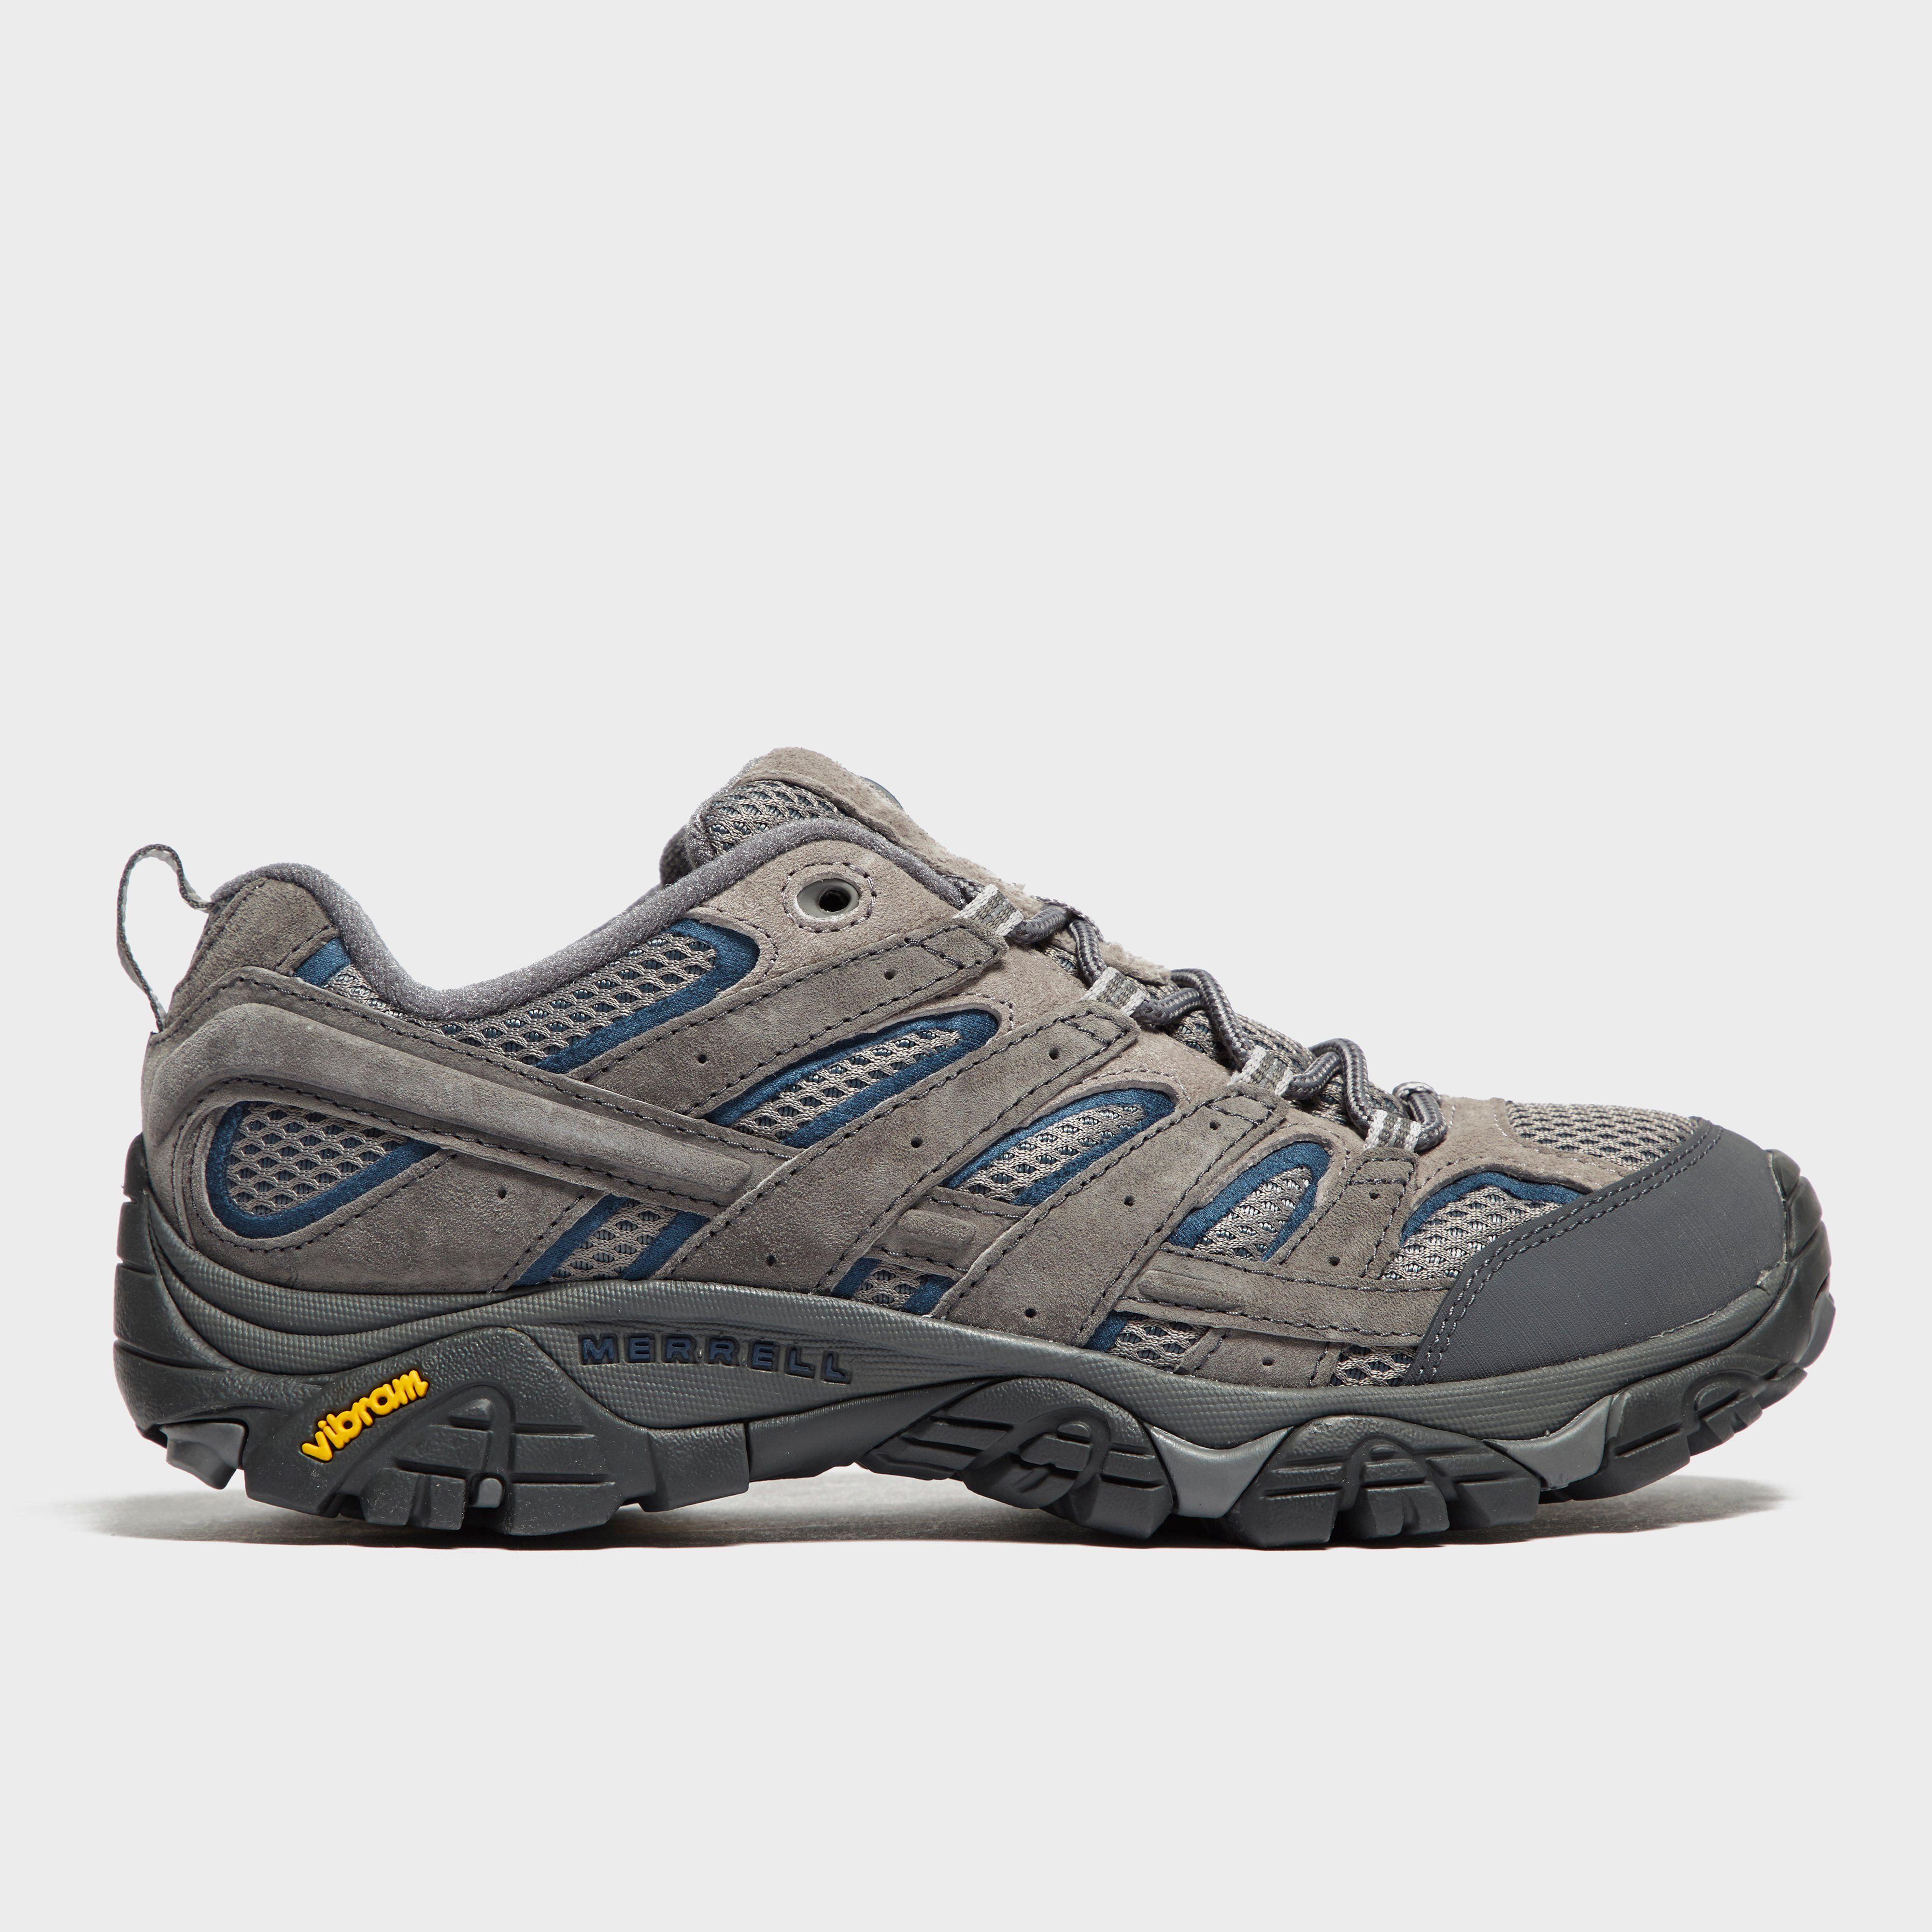 MERRELL Men's Moab 2 Ventilator Hiking Shoe